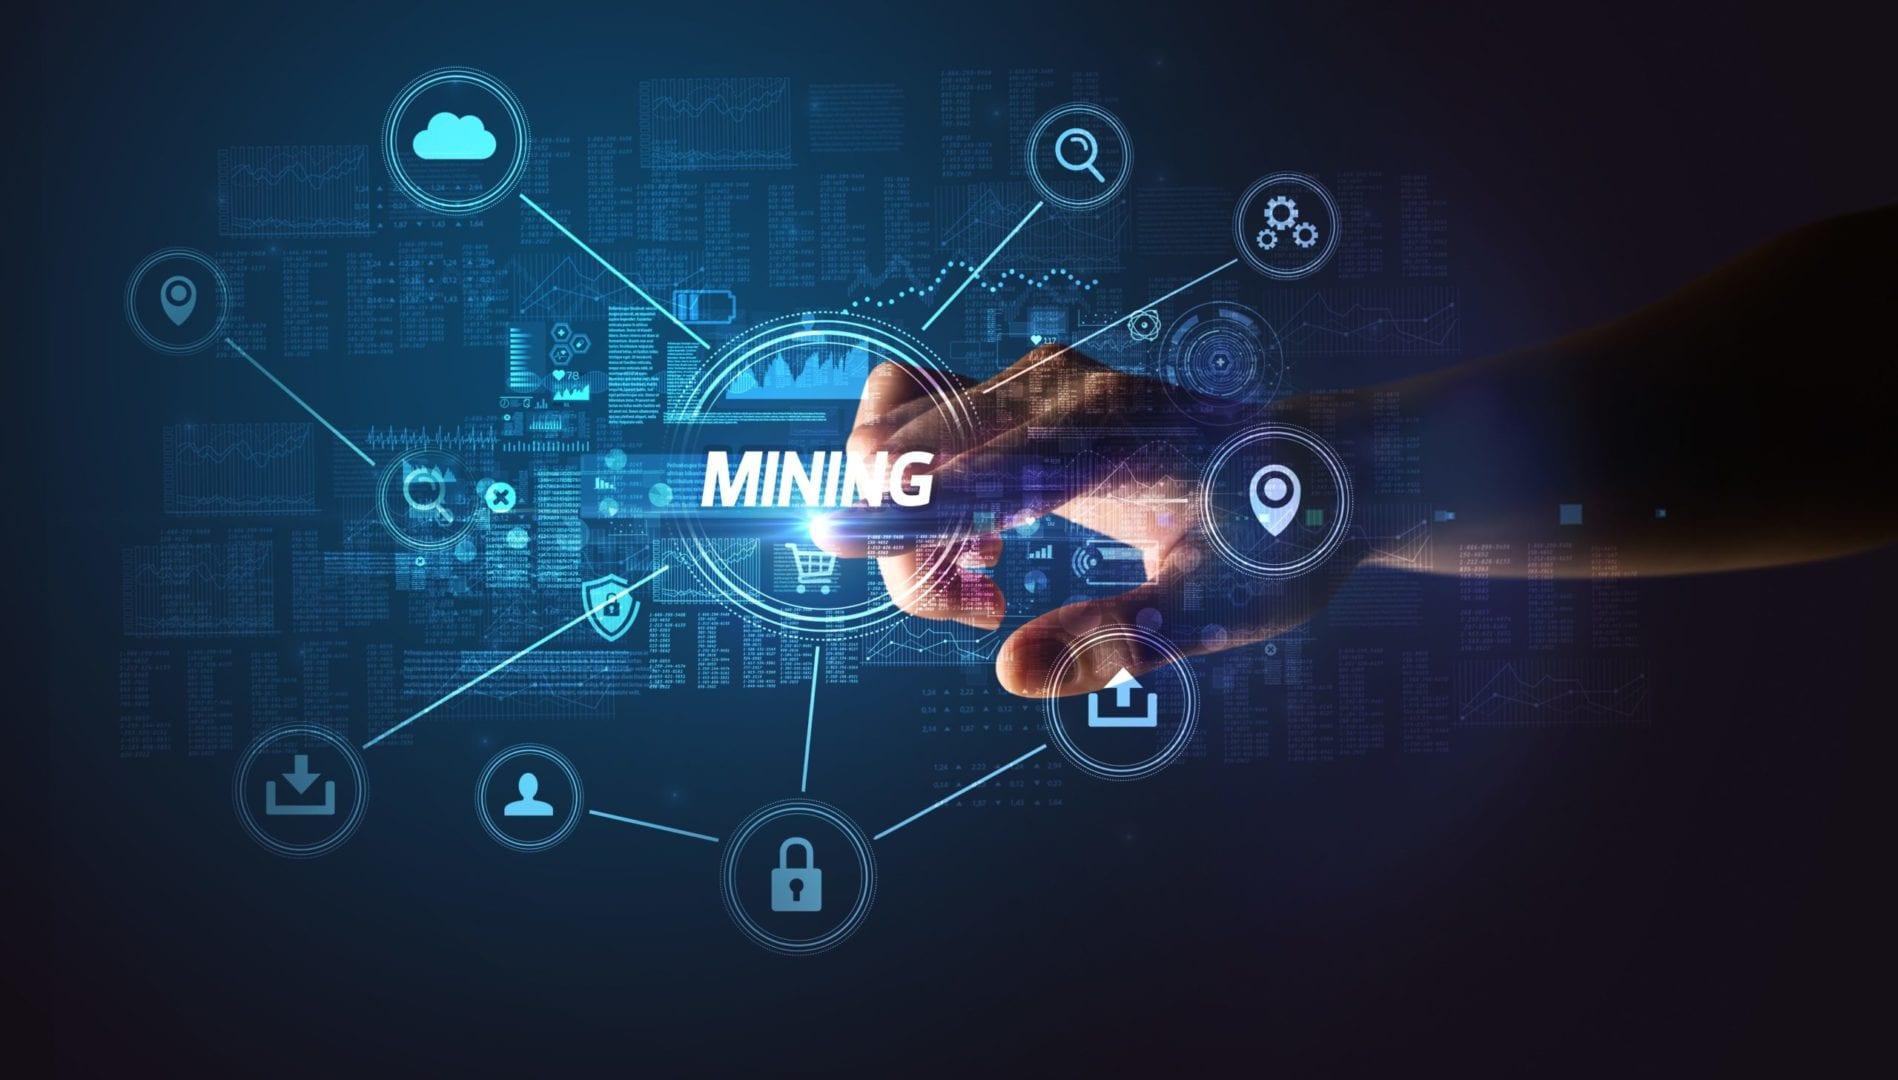 Advanced technologies in digital mining